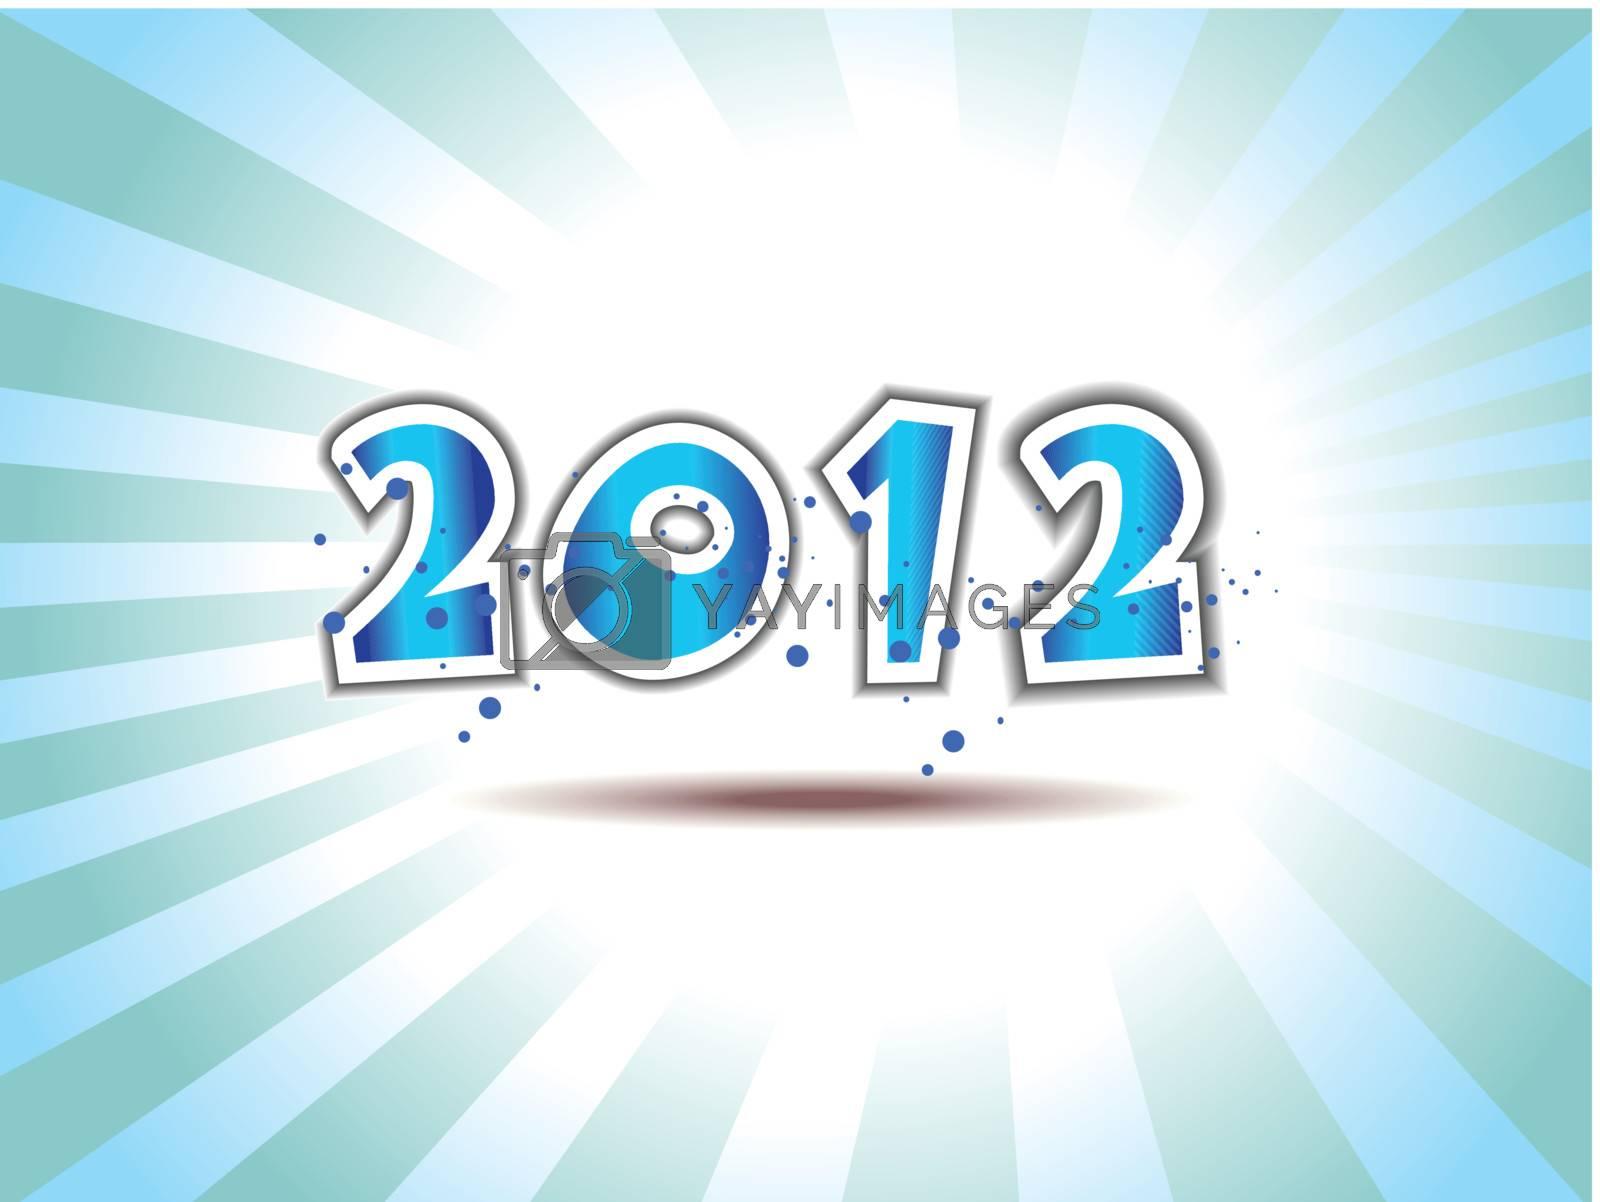 Happy new year 2012  message applique vector design with blue presentation & violet dots.